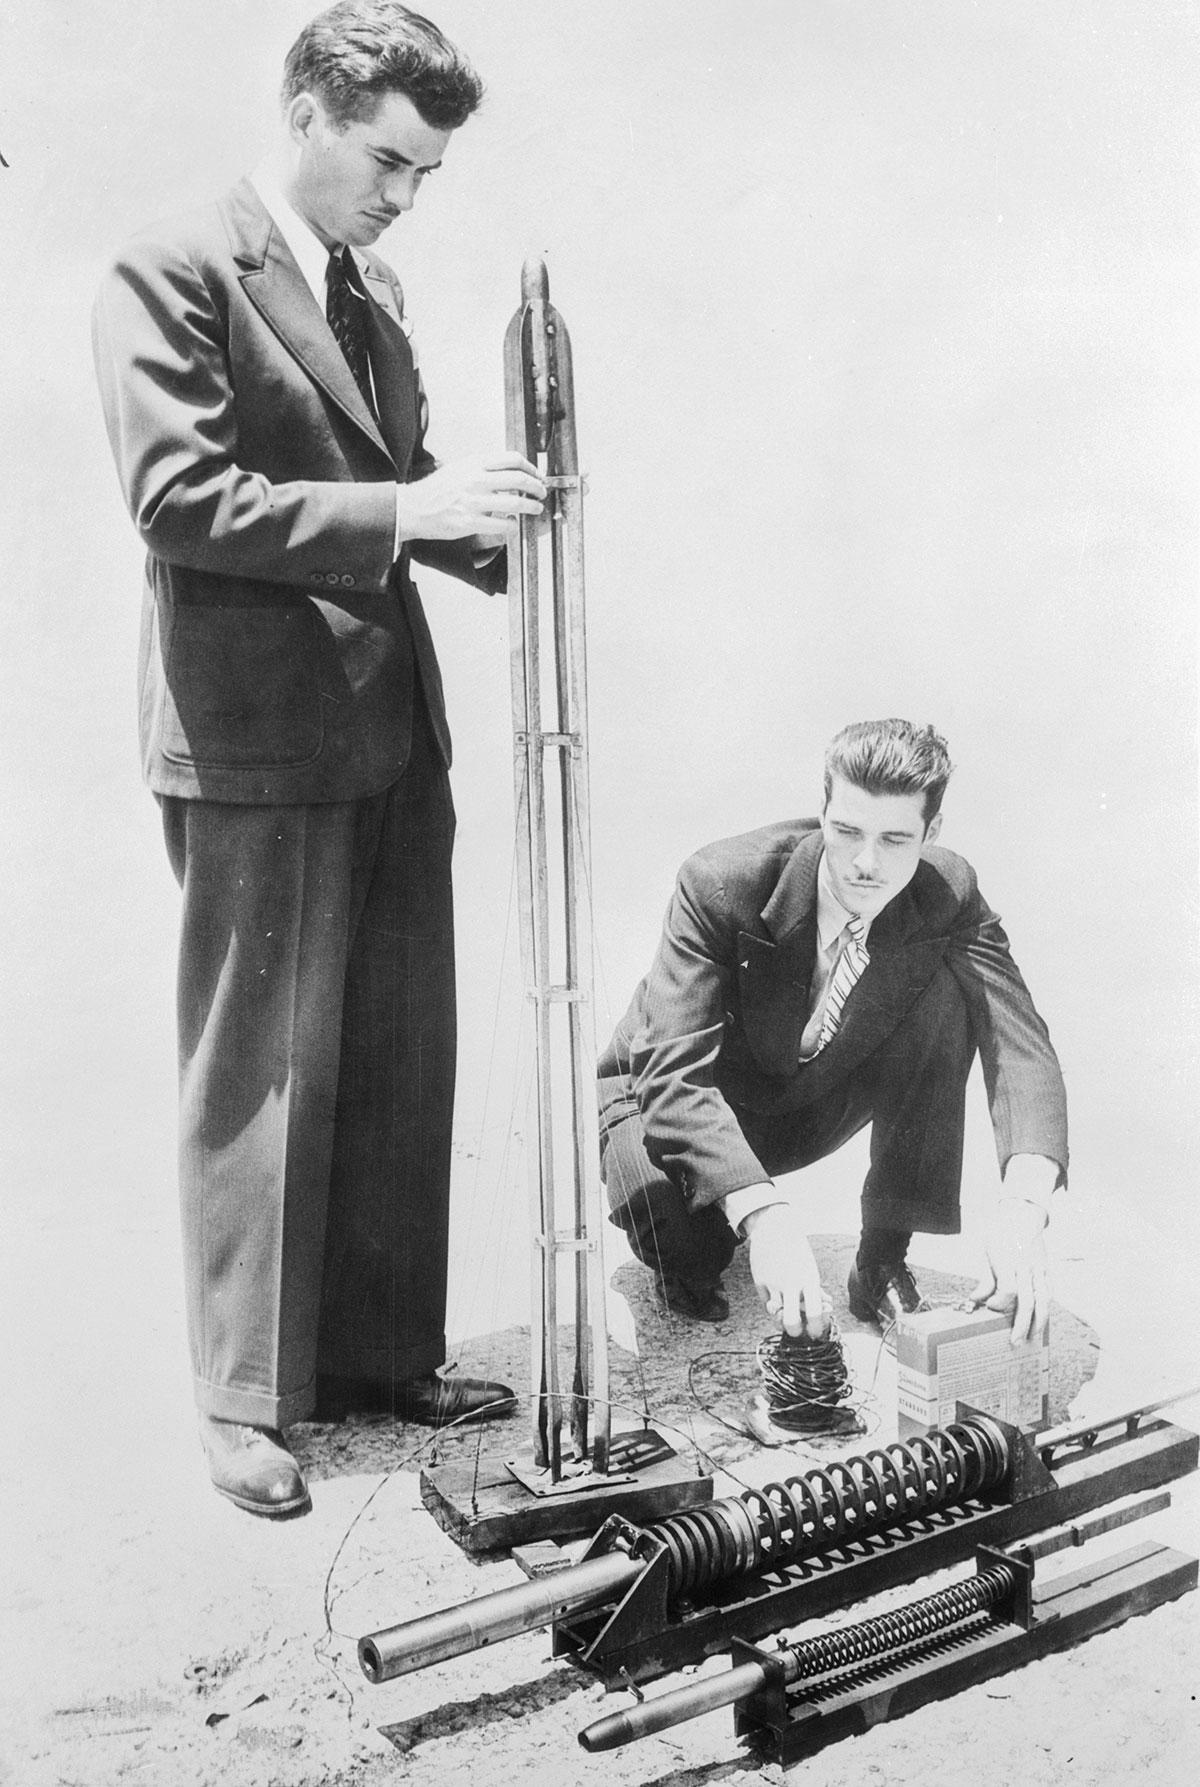 Jack Parson's Rocket Engine